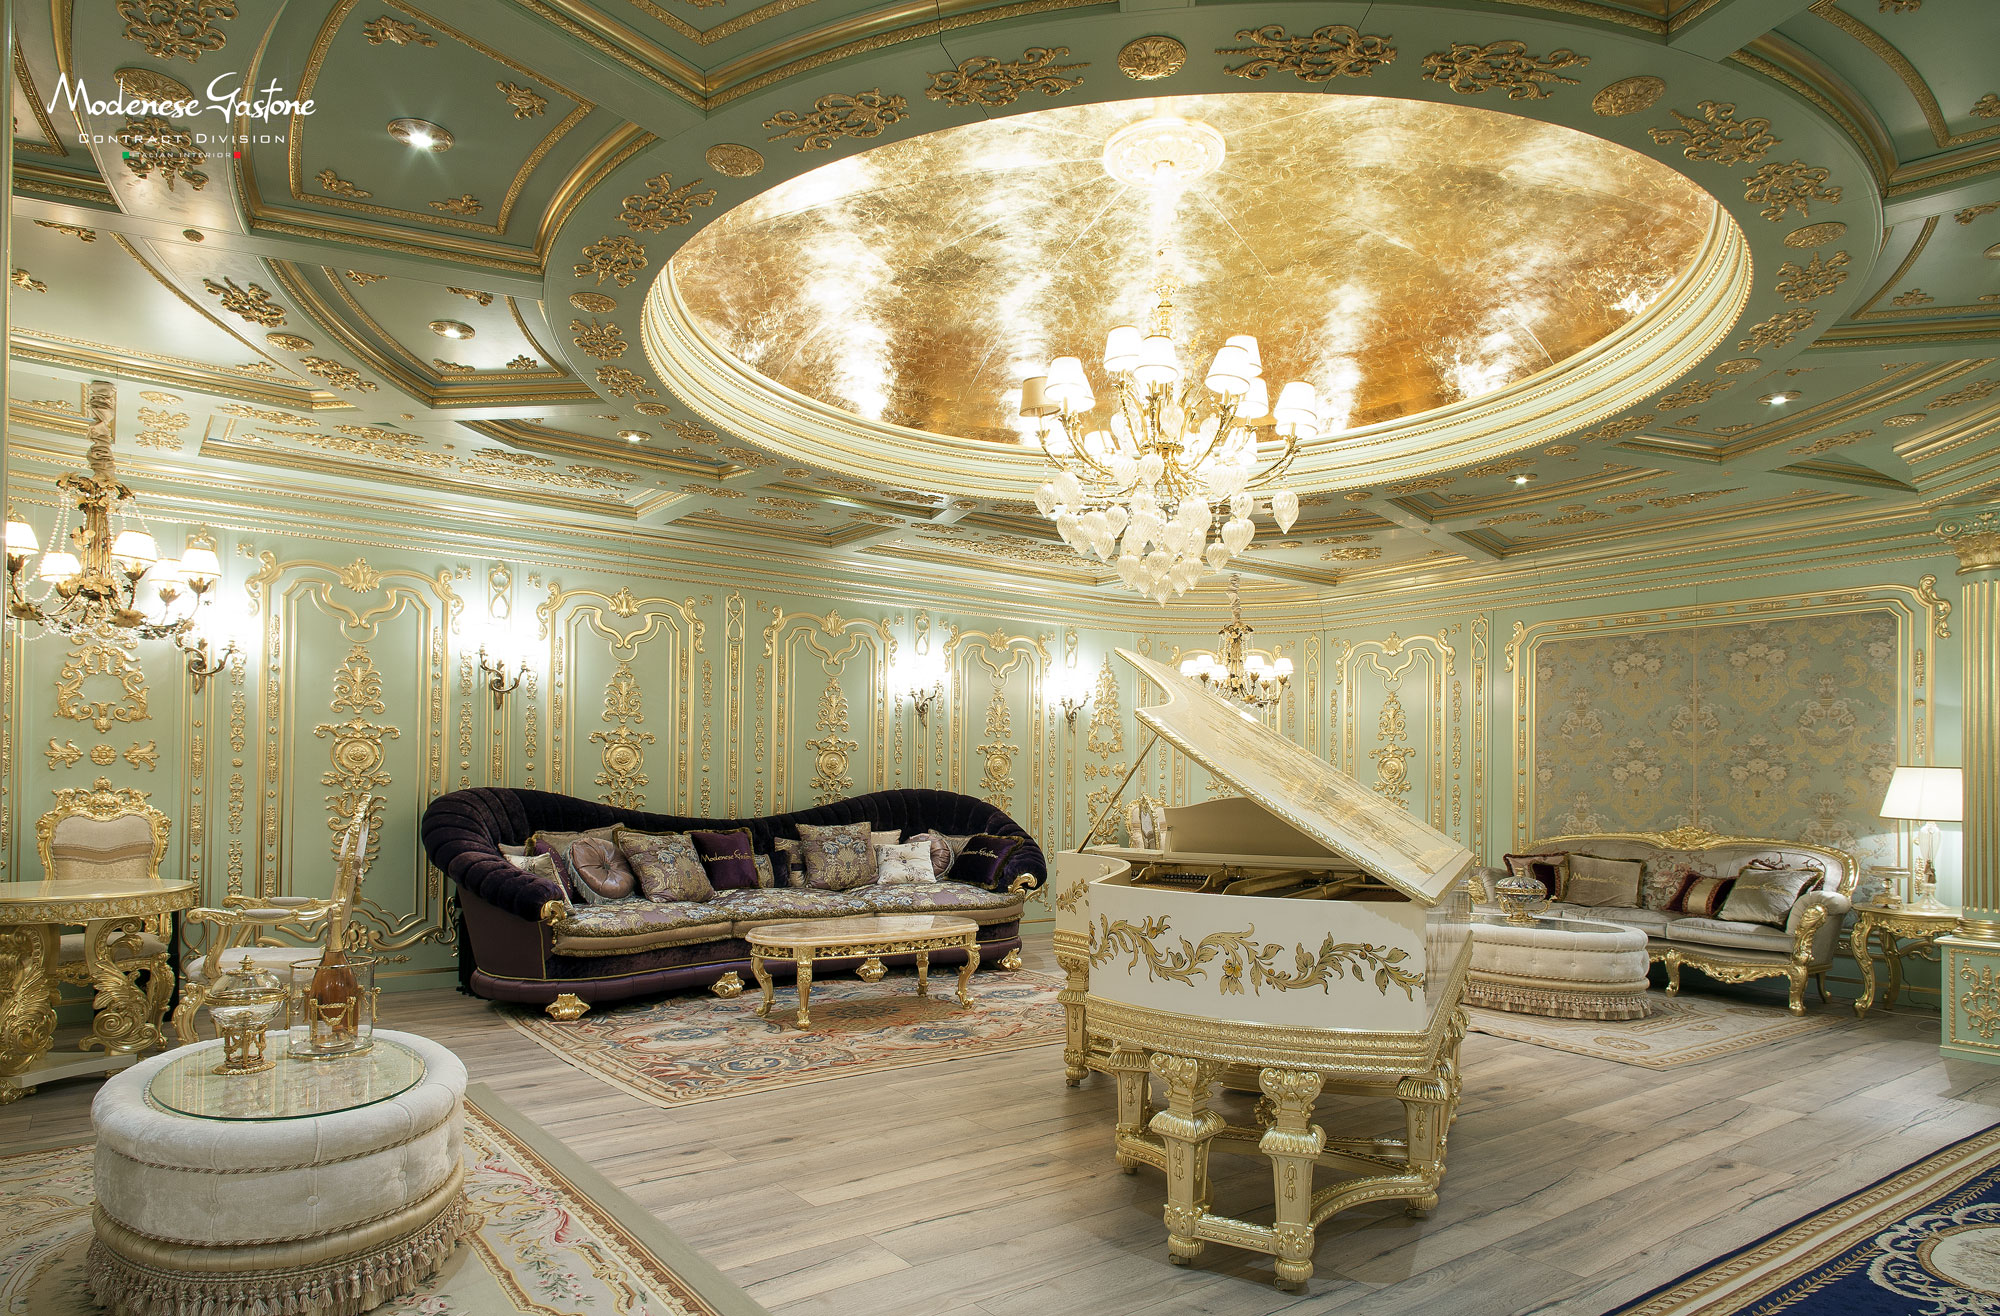 azerbaijan versailles boiserie modenese gastone interiors s r l